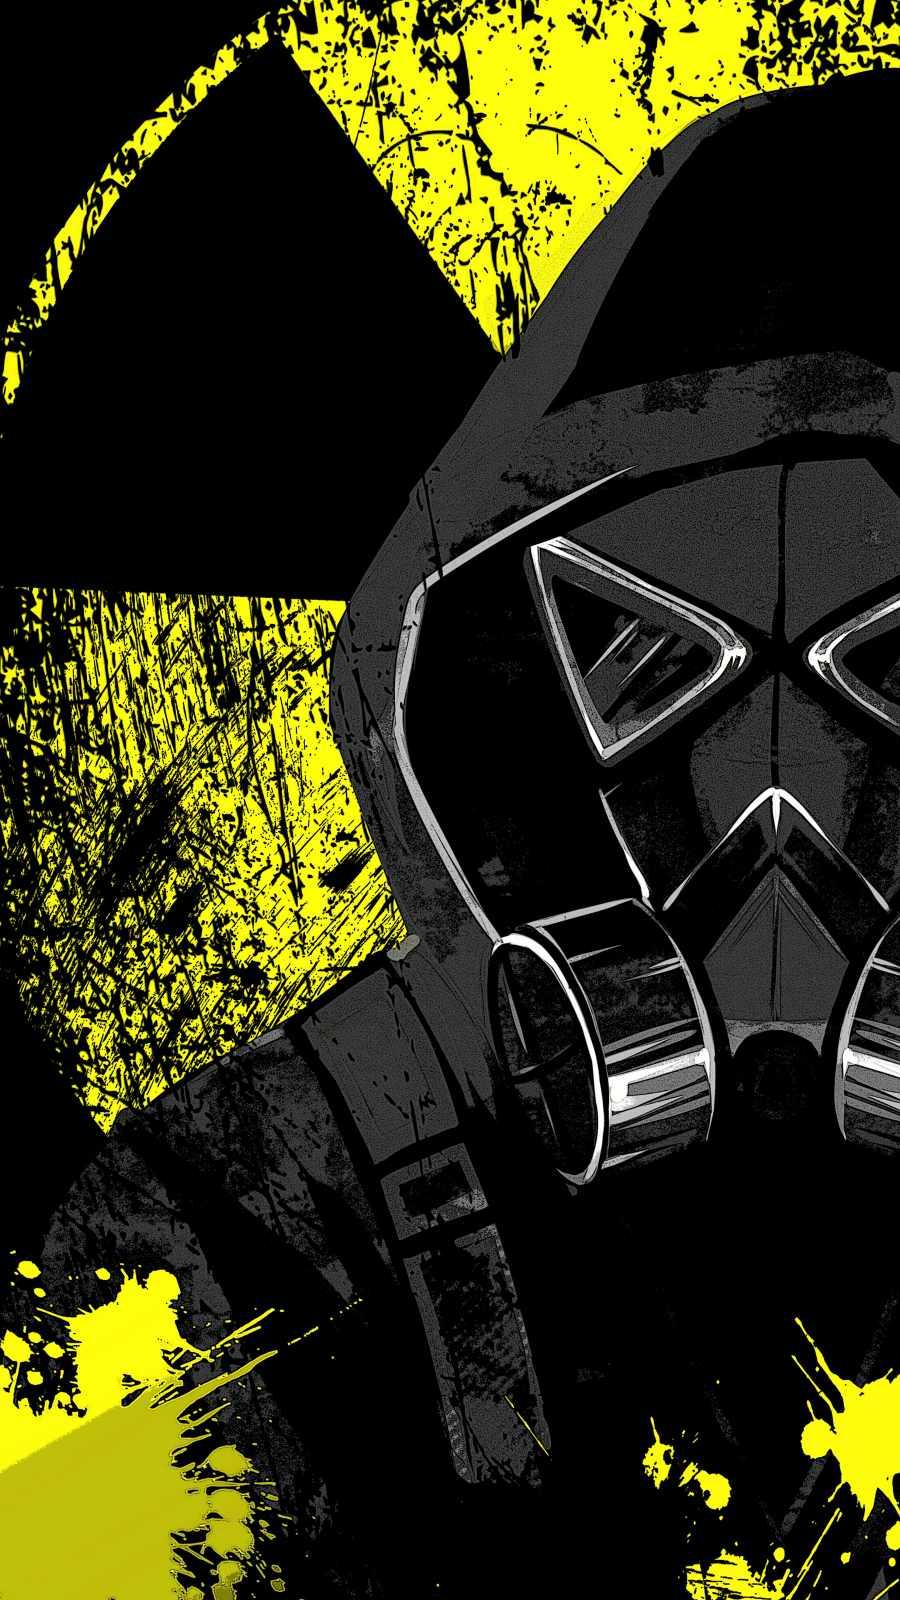 Nuclear Masked Hoodie Guy